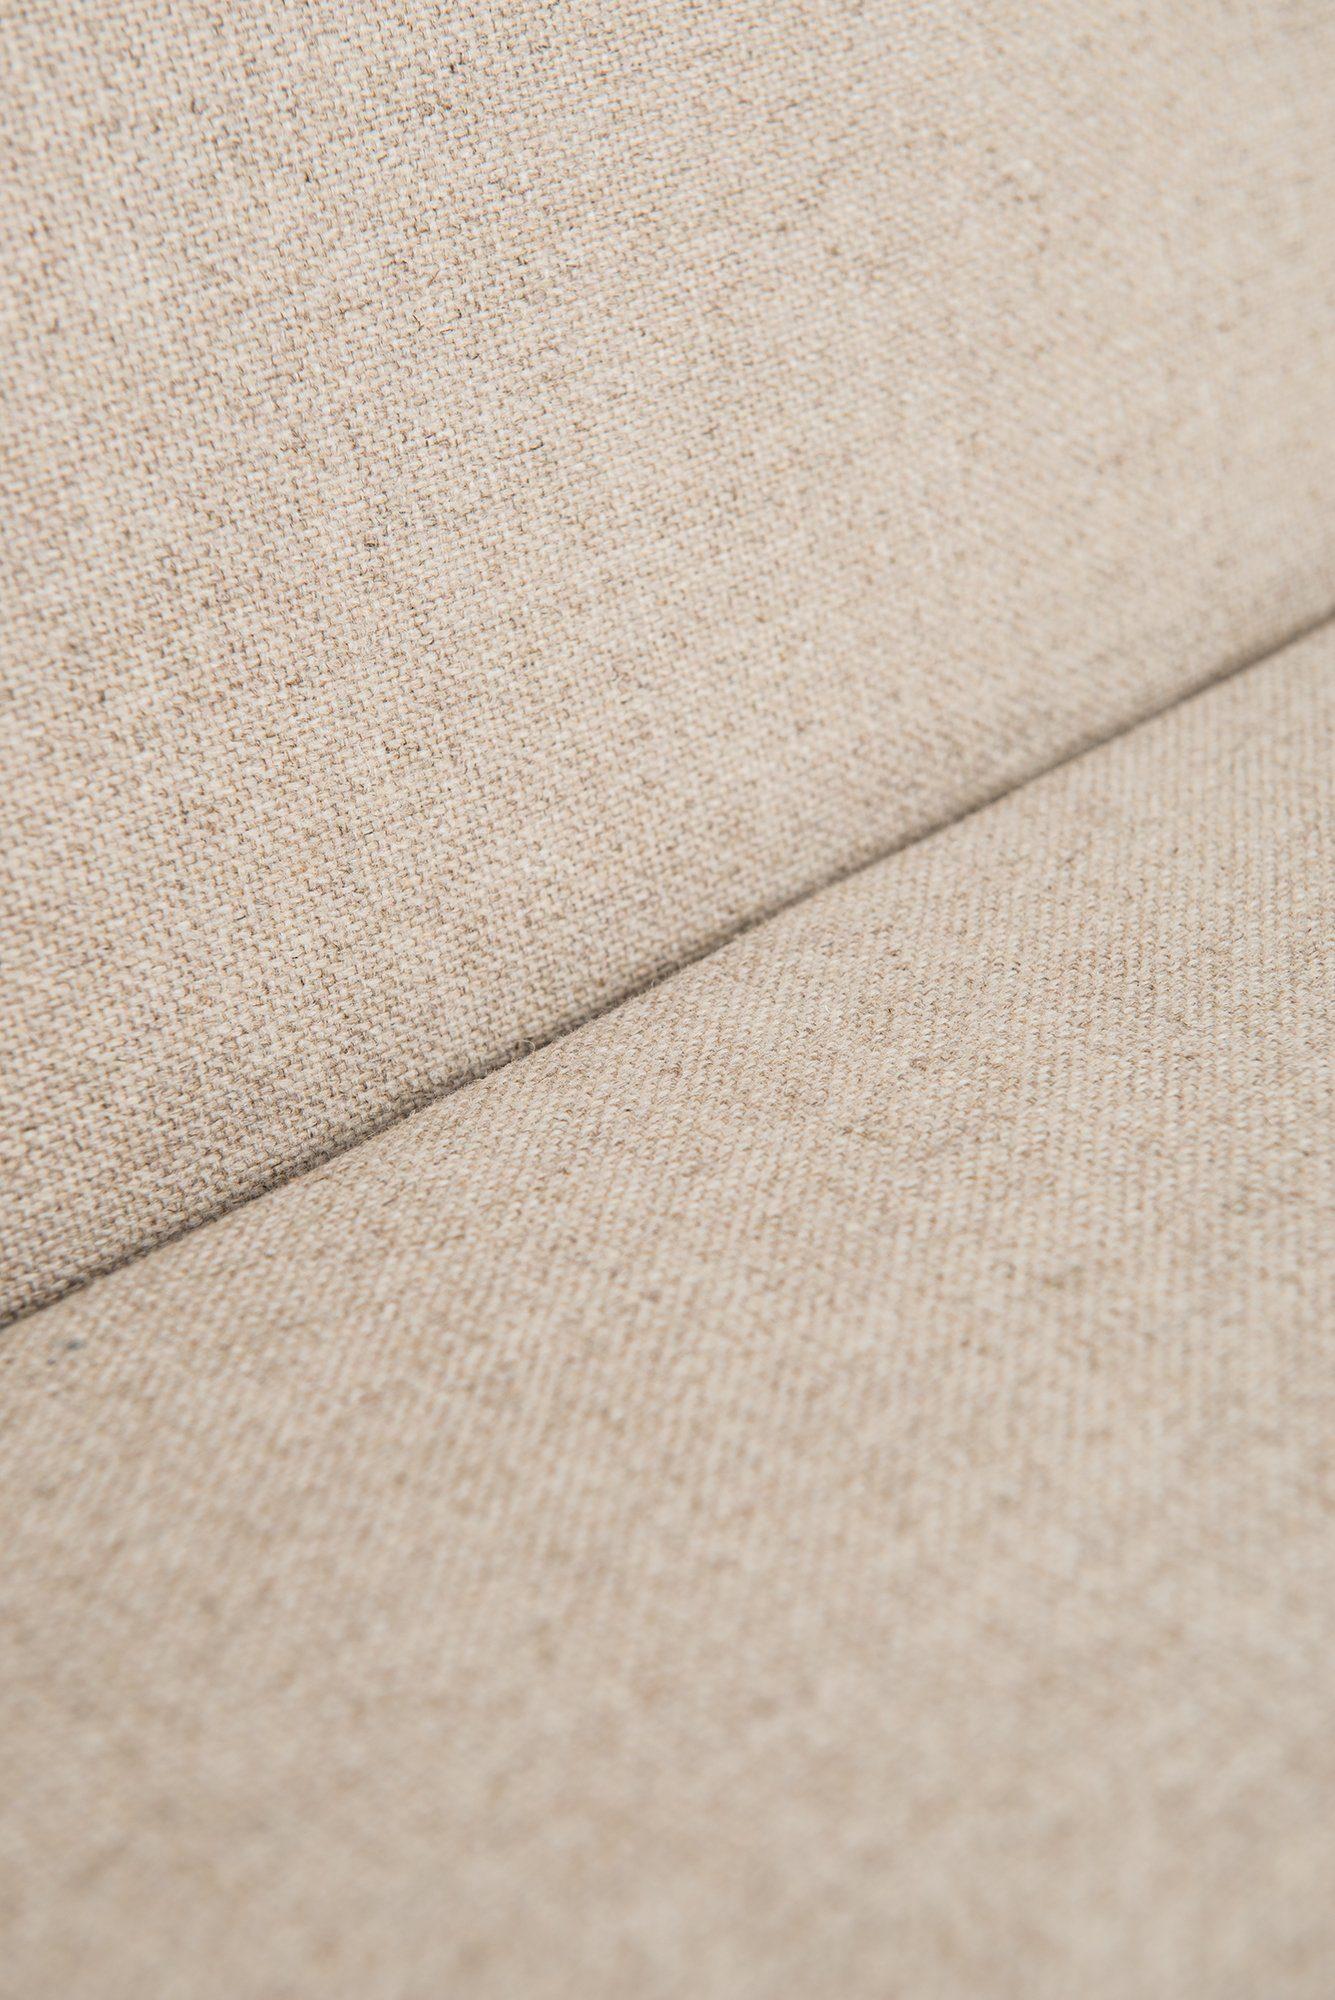 Sofa Trienna St012 (2)